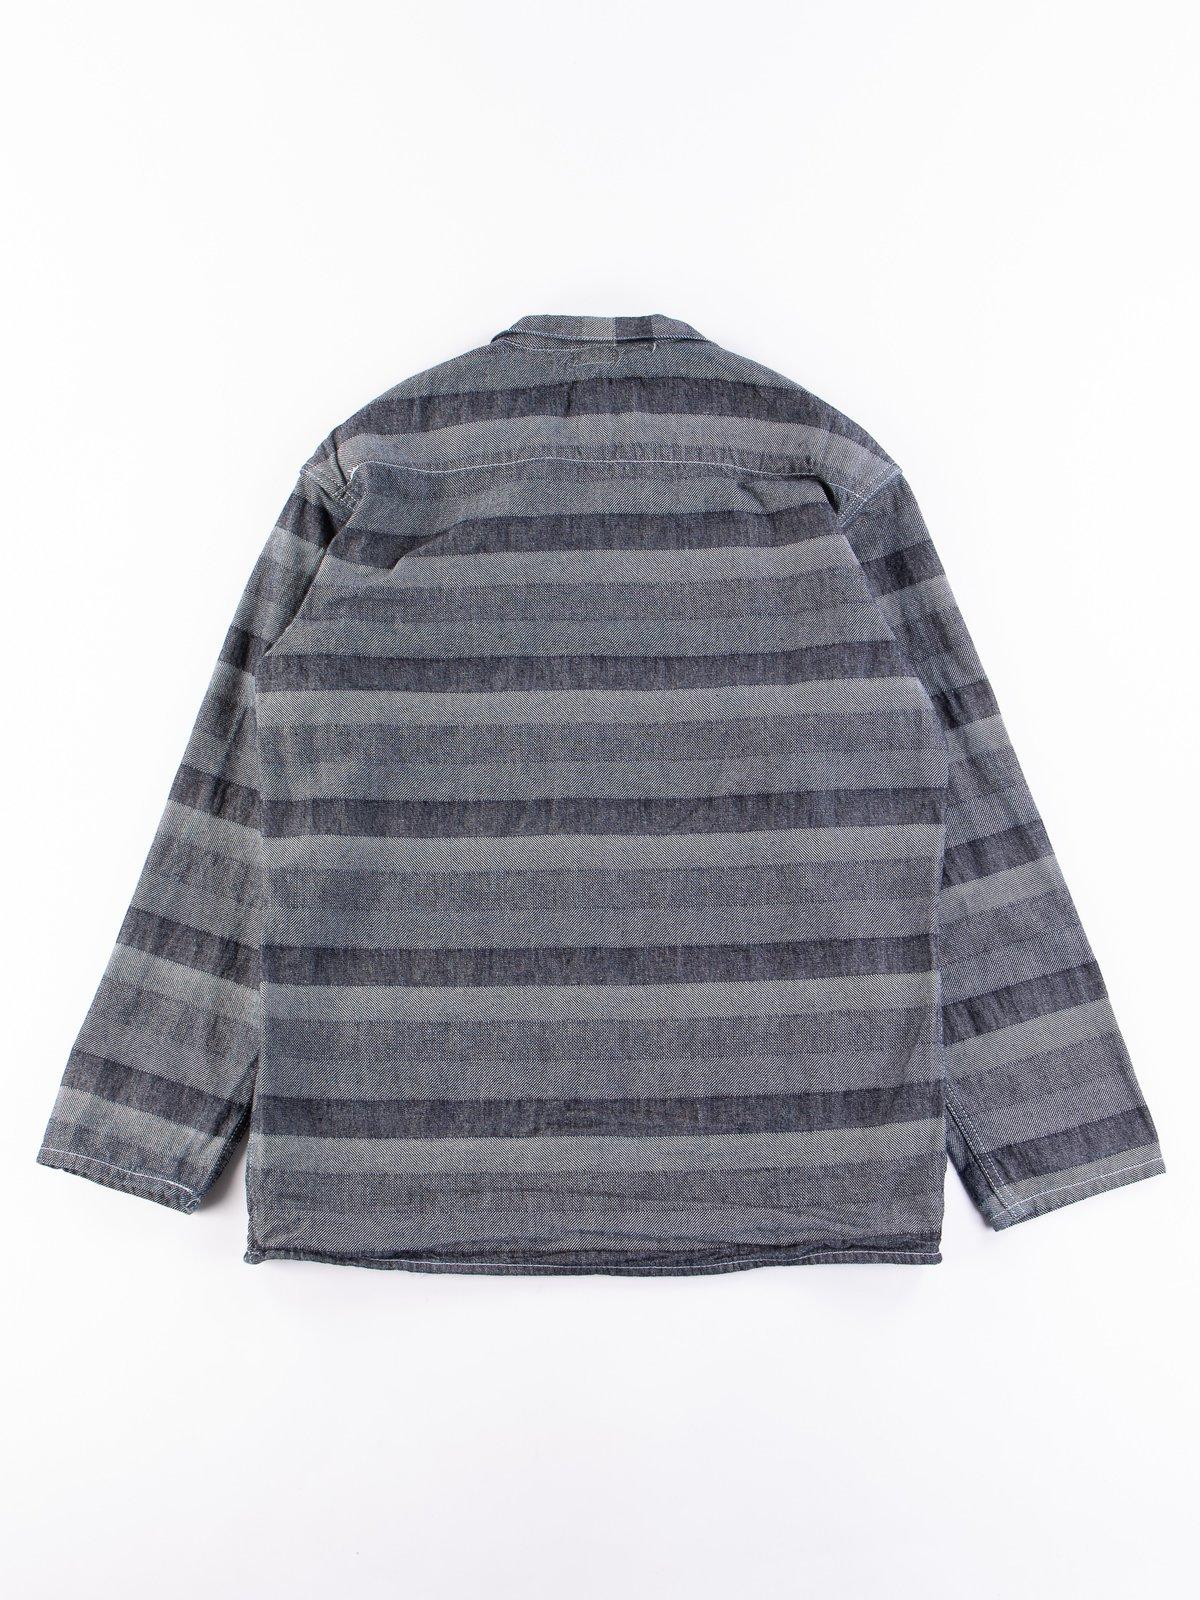 Rinse Washed Indigo Weaver's Blanket Stripe Floor Shirt - Image 7